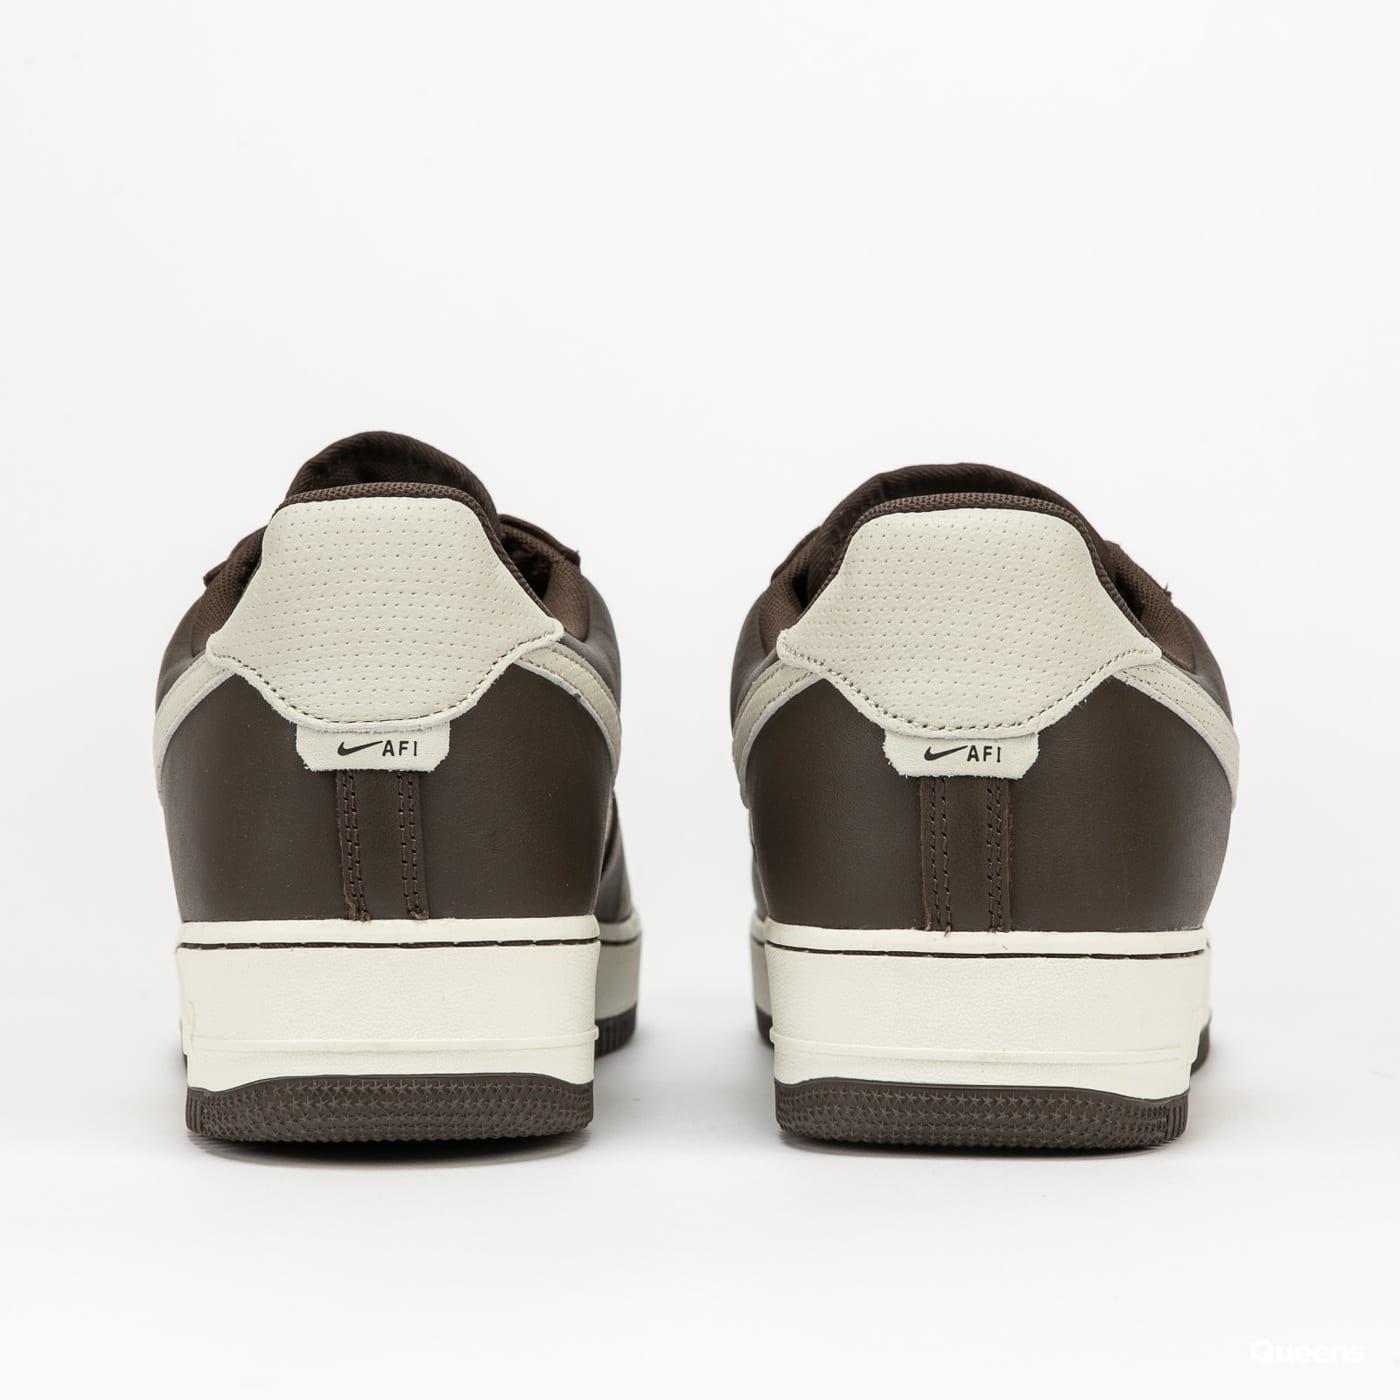 Nike Air Force 1 '07 Craft dark chocolate / light bone - sail